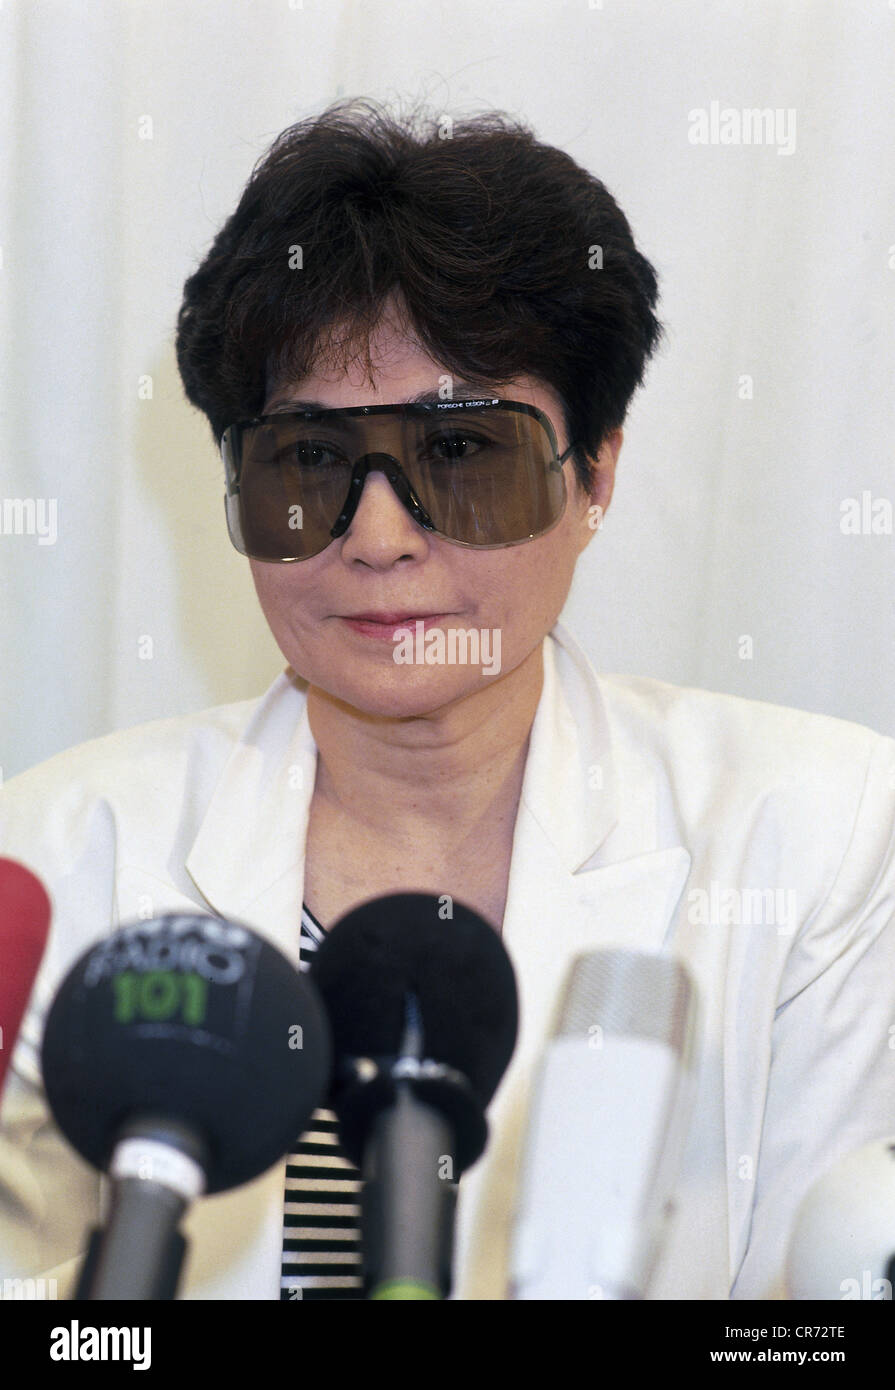 , Yoko Ono, * 18.2.1933, artista japonés, viuda de John Lennon, de longitud media, conferencia de prensa en ocasión Foto de stock